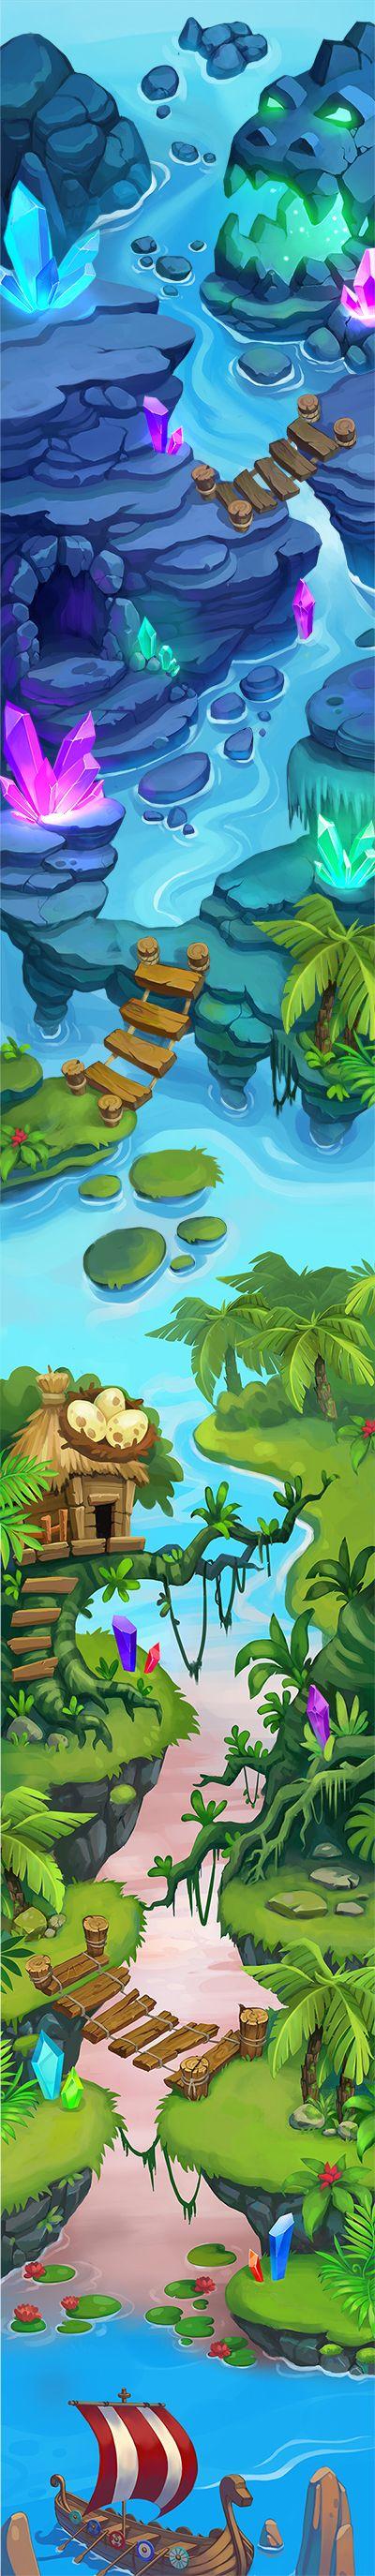 Lil Quest Maps on Behance